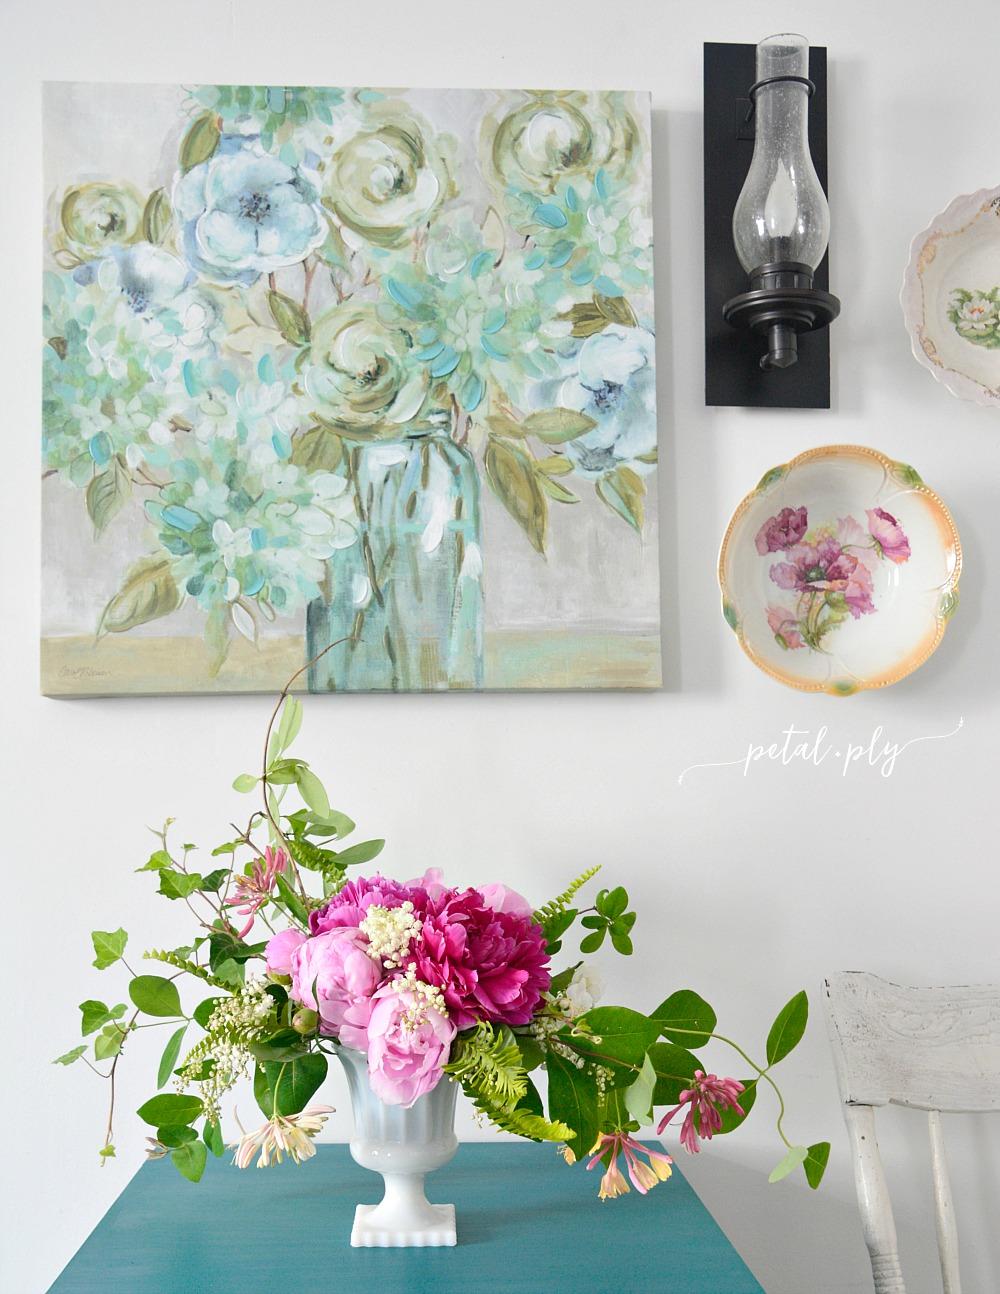 wm-asymmetrical-floral-arrangement